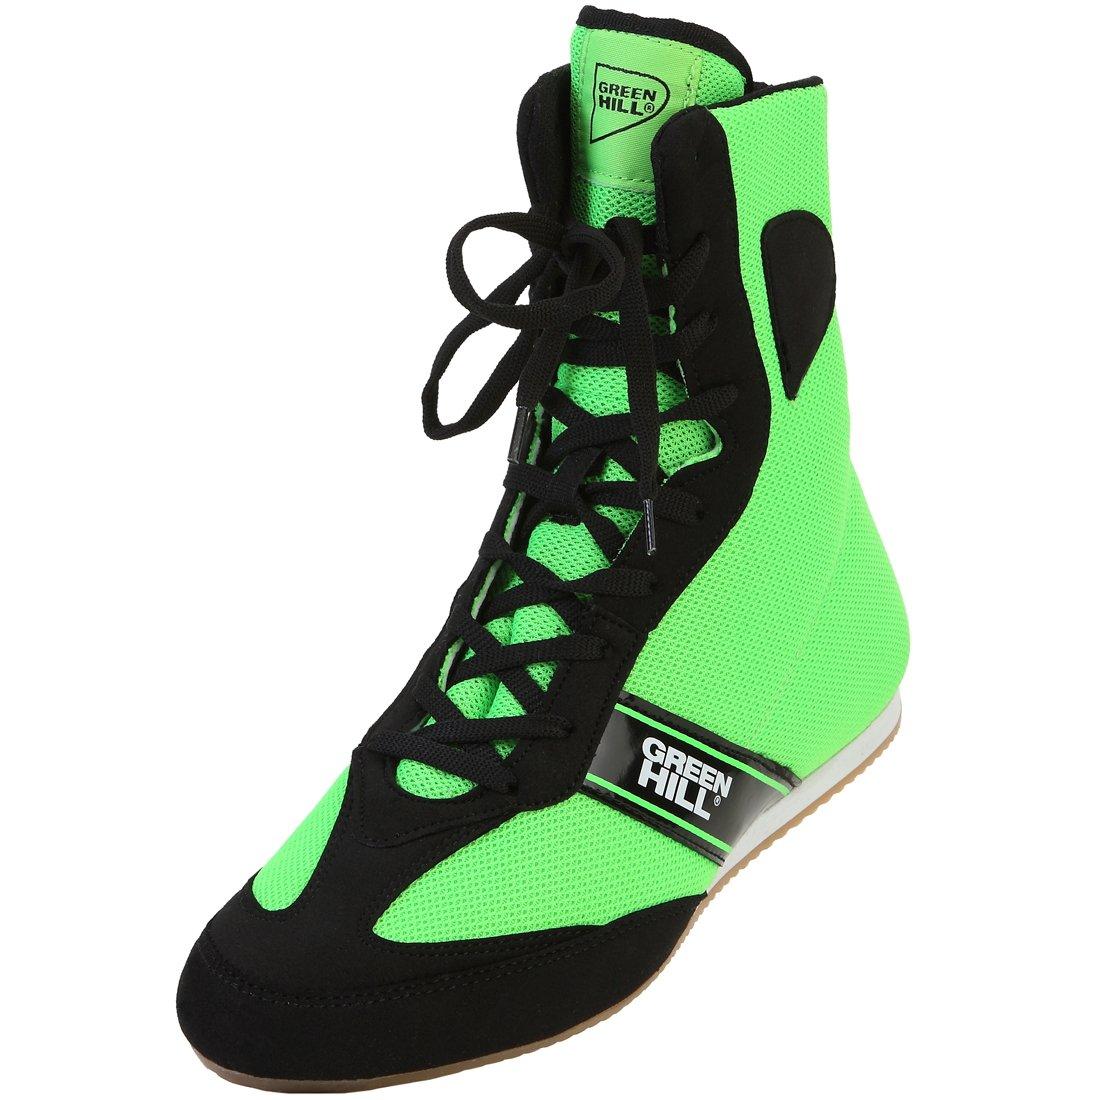 Grün Hill Boxschuhe Boxing schuhe,Boxerschuhe High-Top Boxing Stiefel Stiefel Boxing Boxen Stiefel,Boxing Training Stiefel Trainingsschuh for Boxing Professional Training. 29f76f